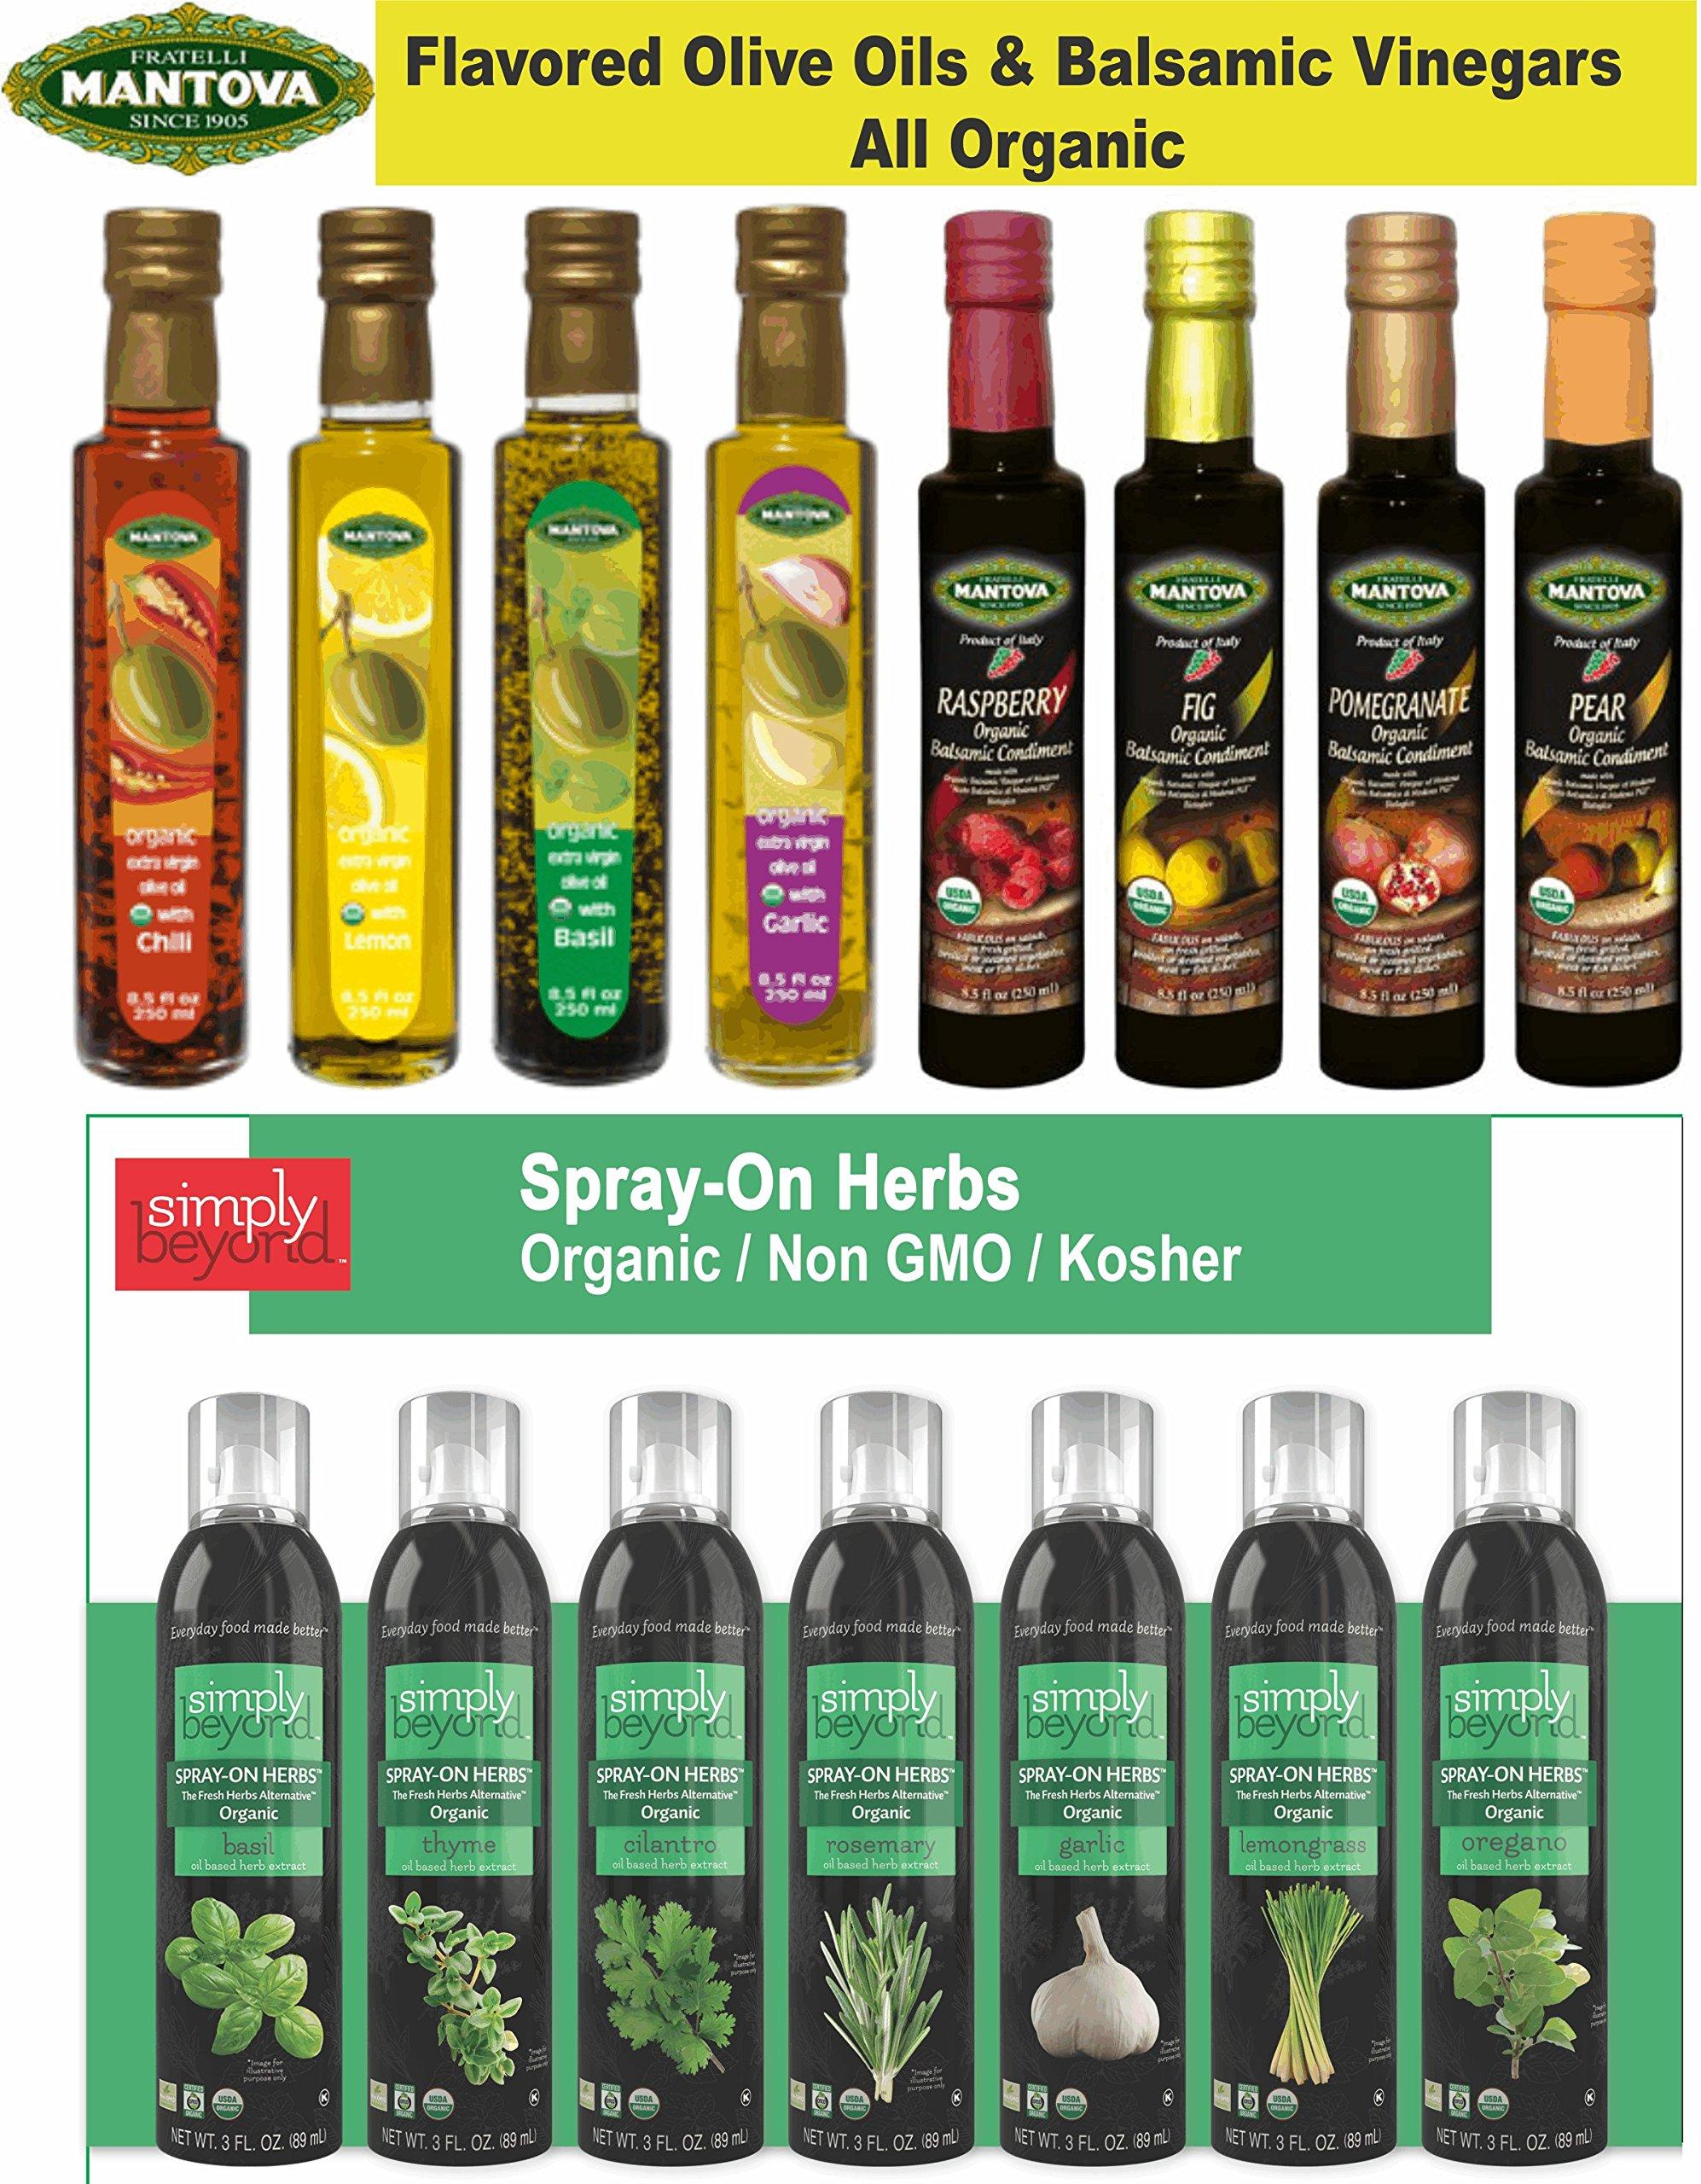 Mantova Organic Flavored EVOO, Balsamic Vinegars & Simply Beyond Complete line of Organic Herbs